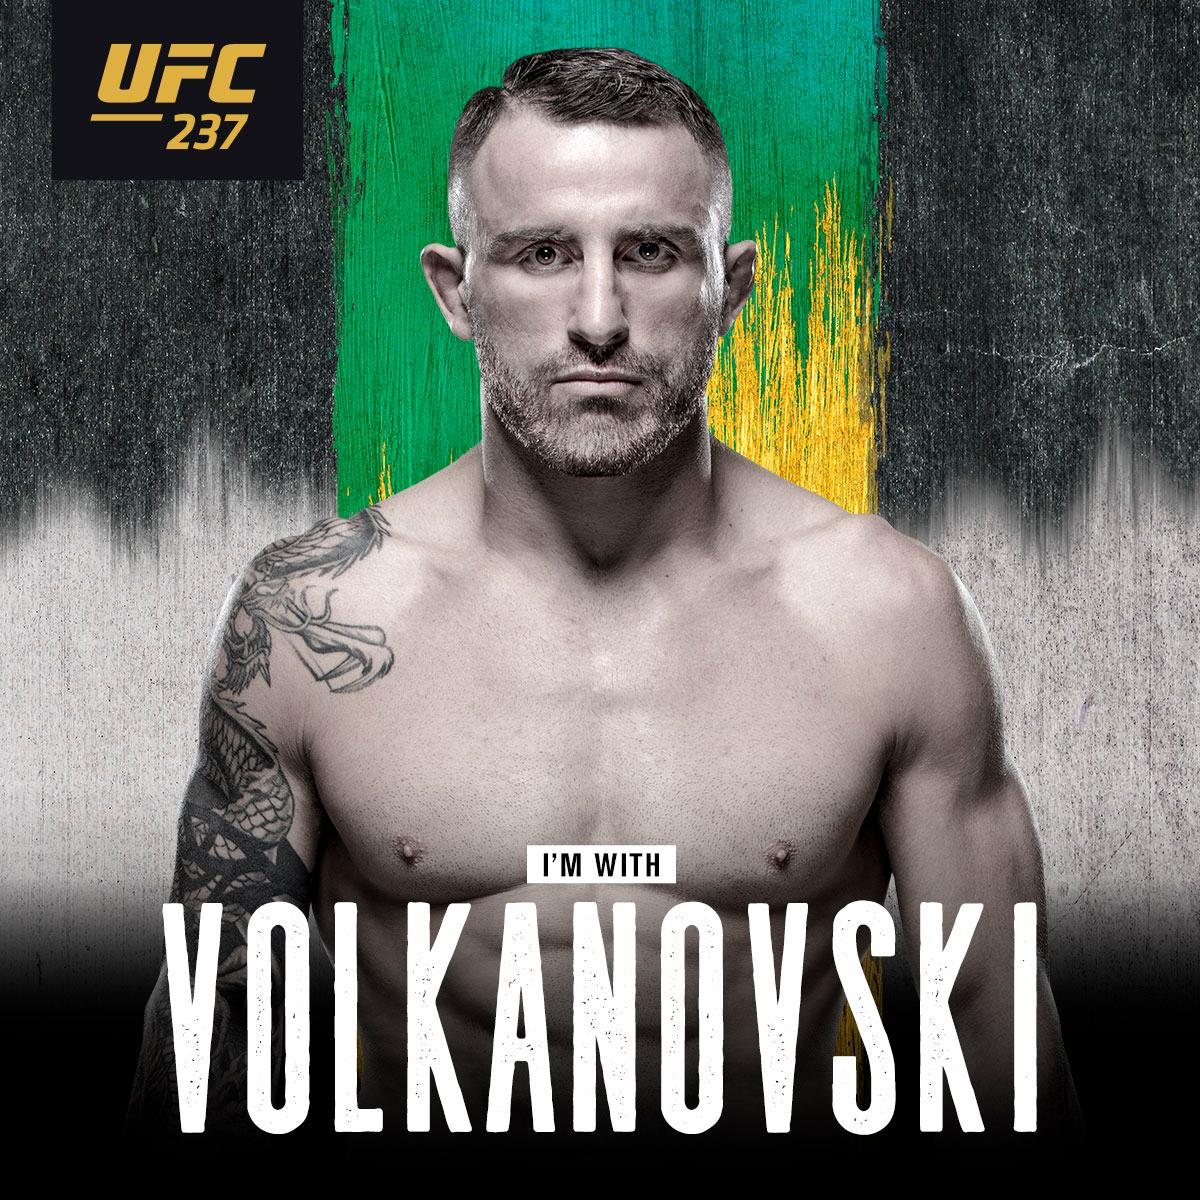 I'm with @AlexVolkanovski  #UFC237 this Sunday on Pay-Per-View